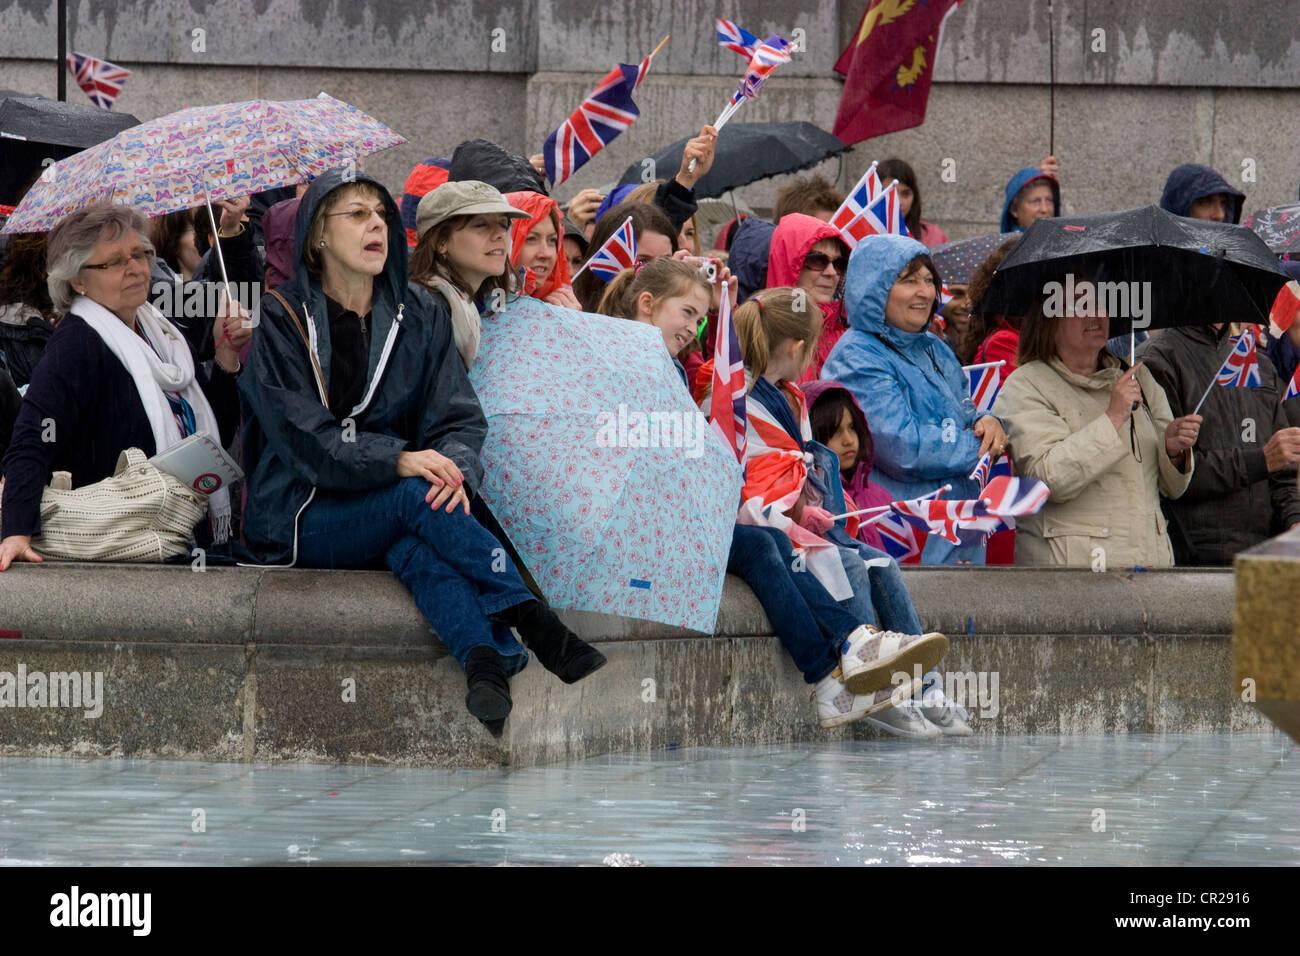 queens royal diamond jubilee 2012, revellers shelter in rain by fountain in trafalgar square London - Stock Image